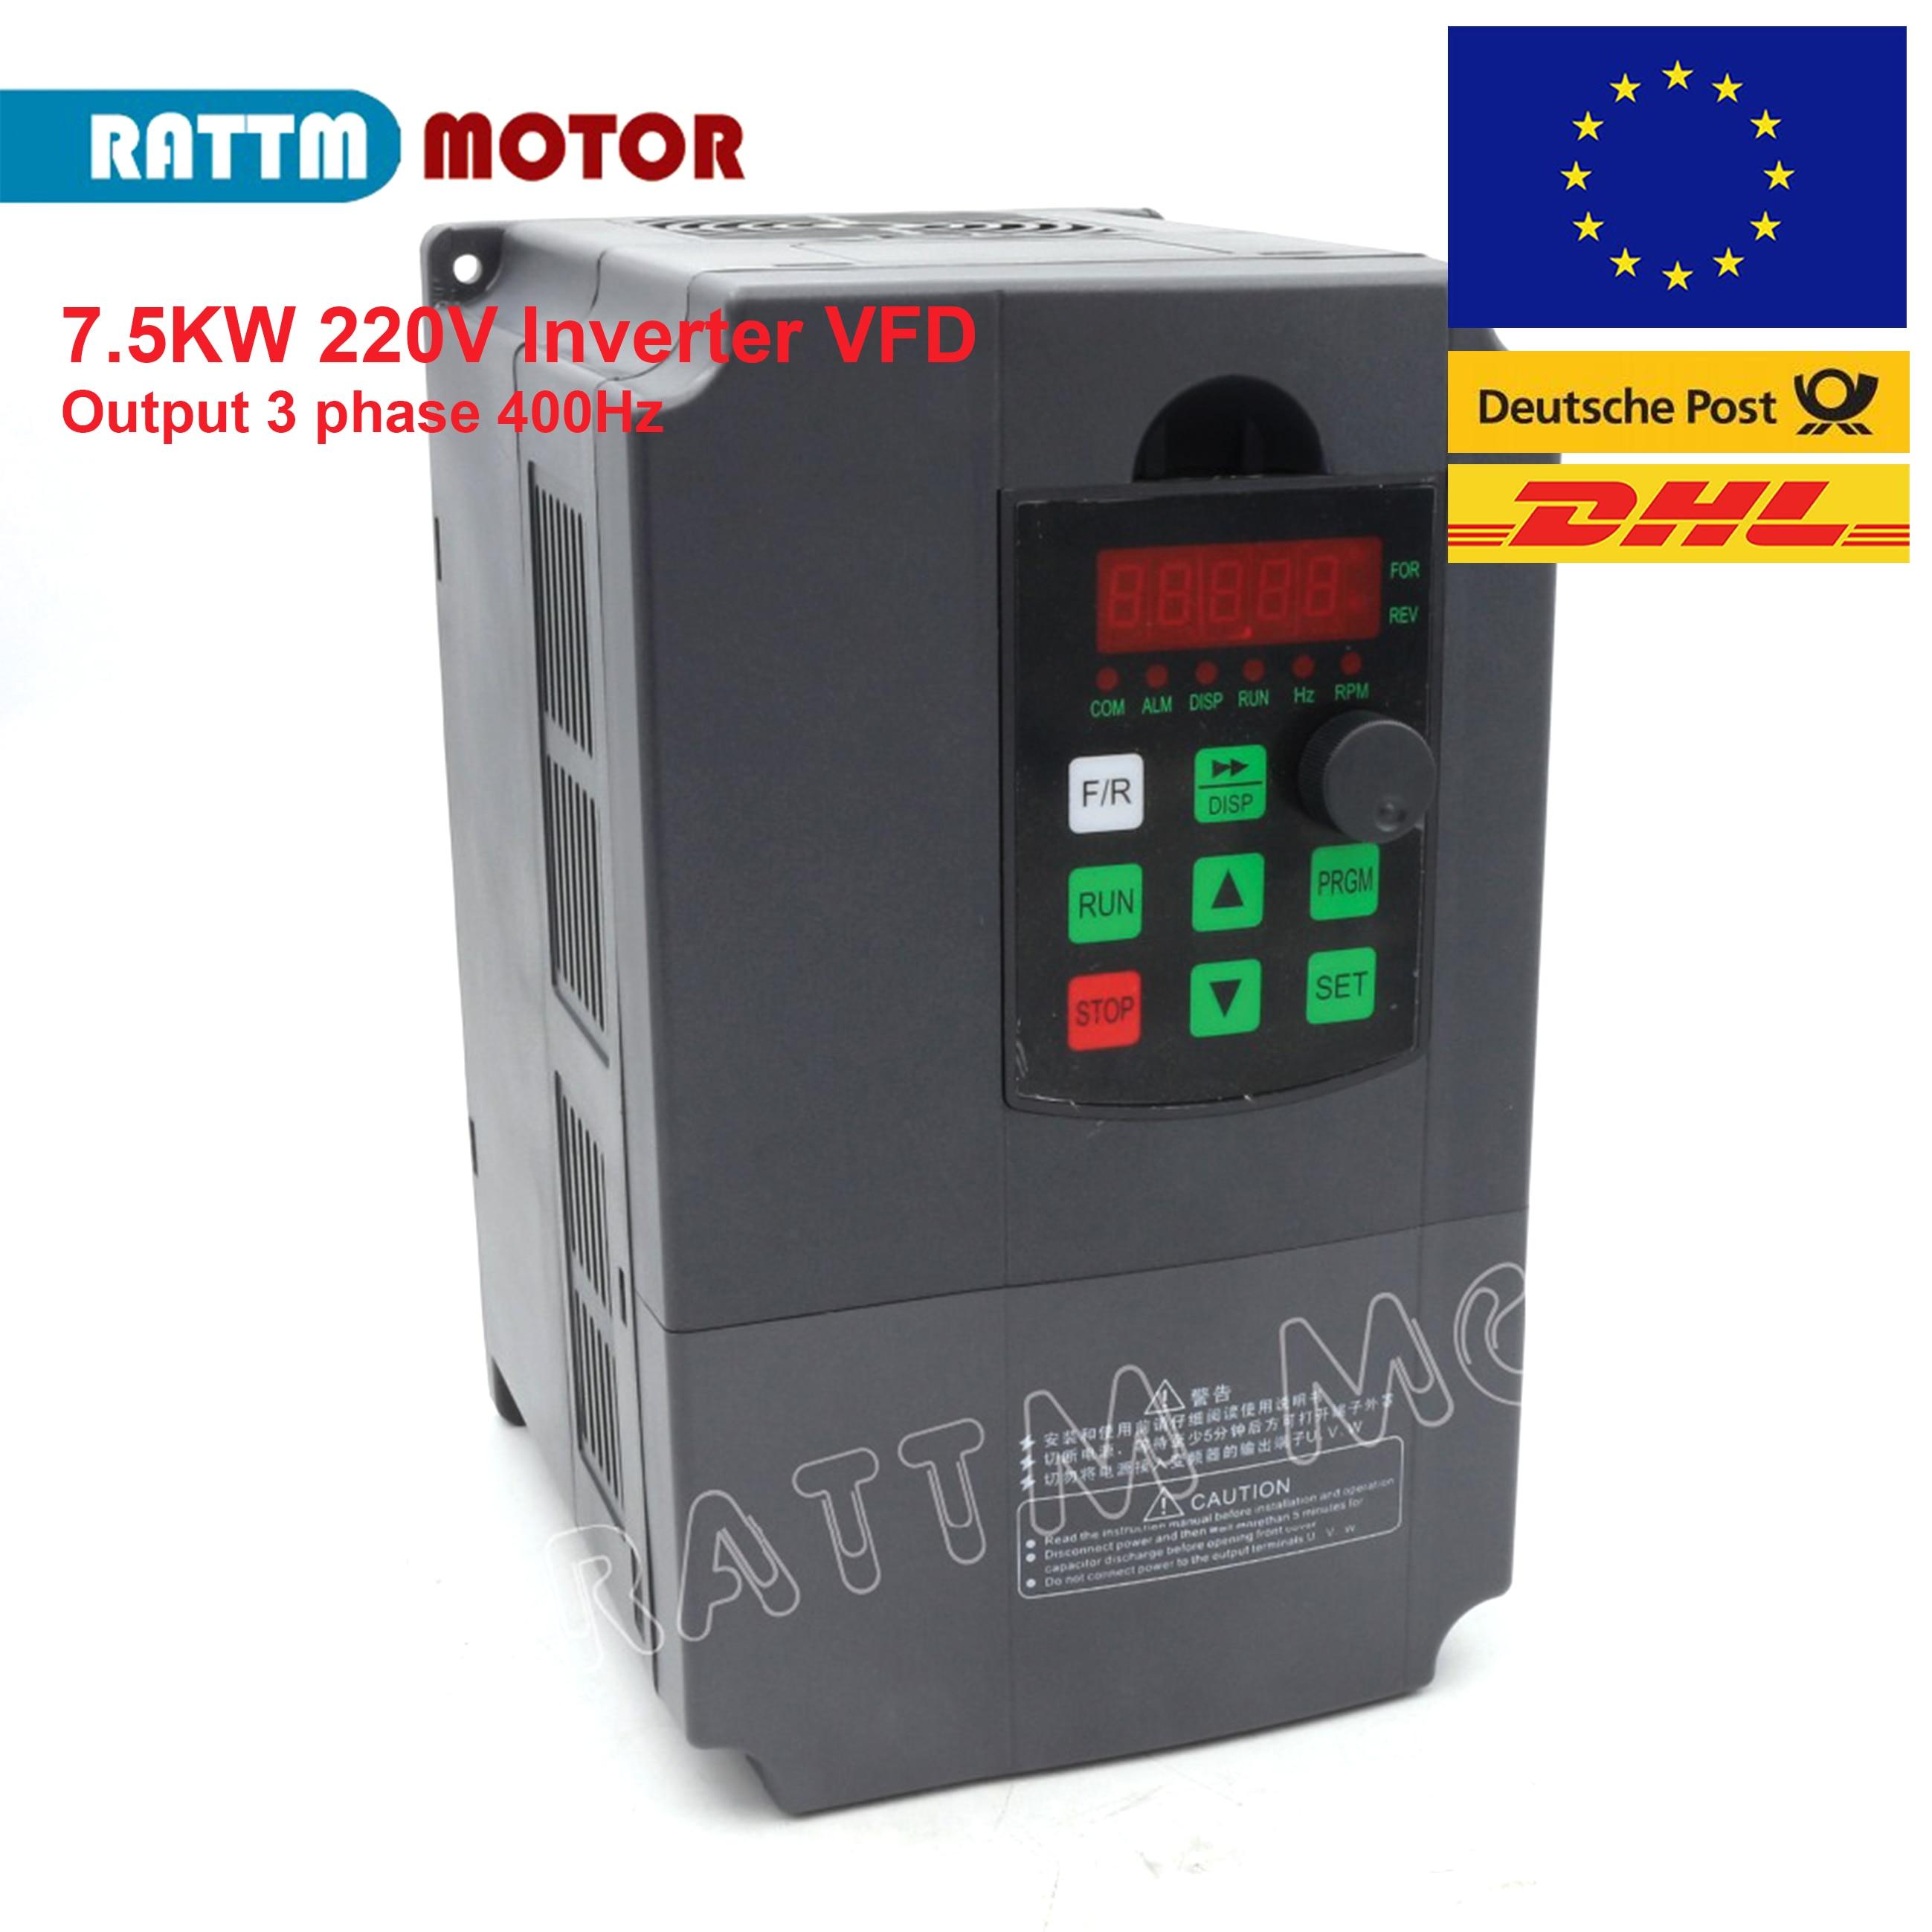 EU Lieferung! 7.5KW 220V Variabler Frequenz VFD Inverter Ausgang 3 phase 400Hz Spindel Motor Speed Controller Frequenz Conveter